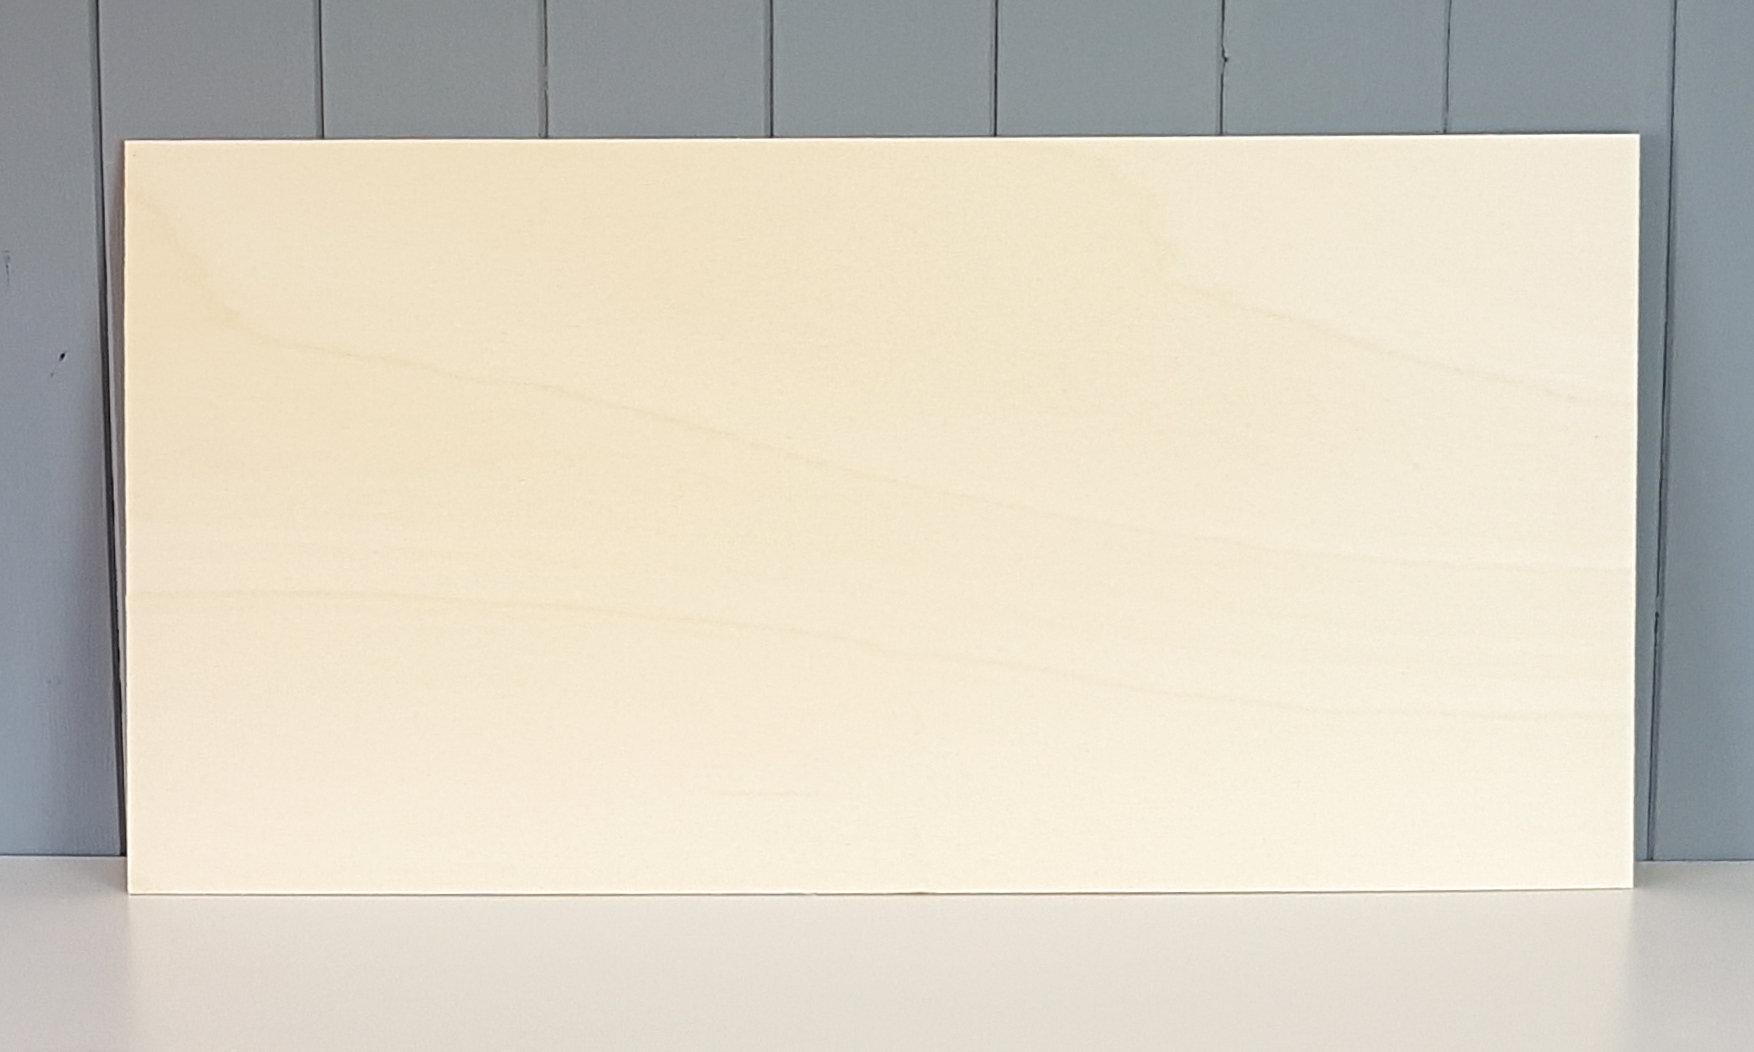 600mm x 300mm (2' x 1') 3mm Poplar Plywood Sheet AB/AB Grade